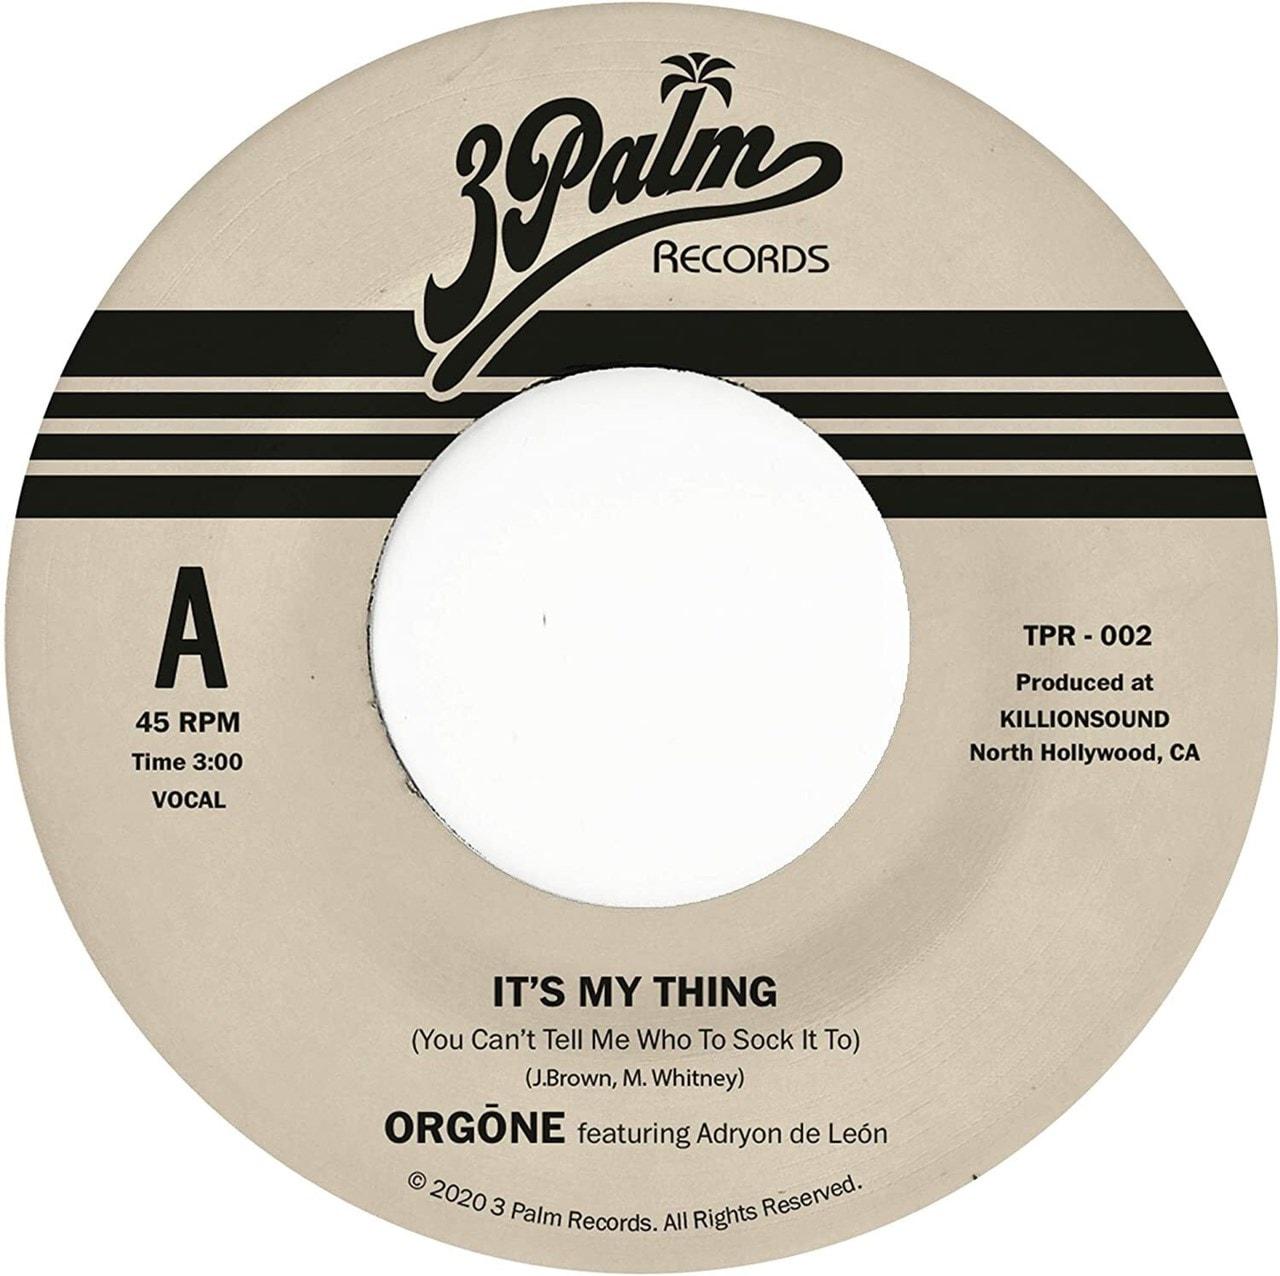 It's My Thing (You Can't Tell Me Who to Sock It To) - 1